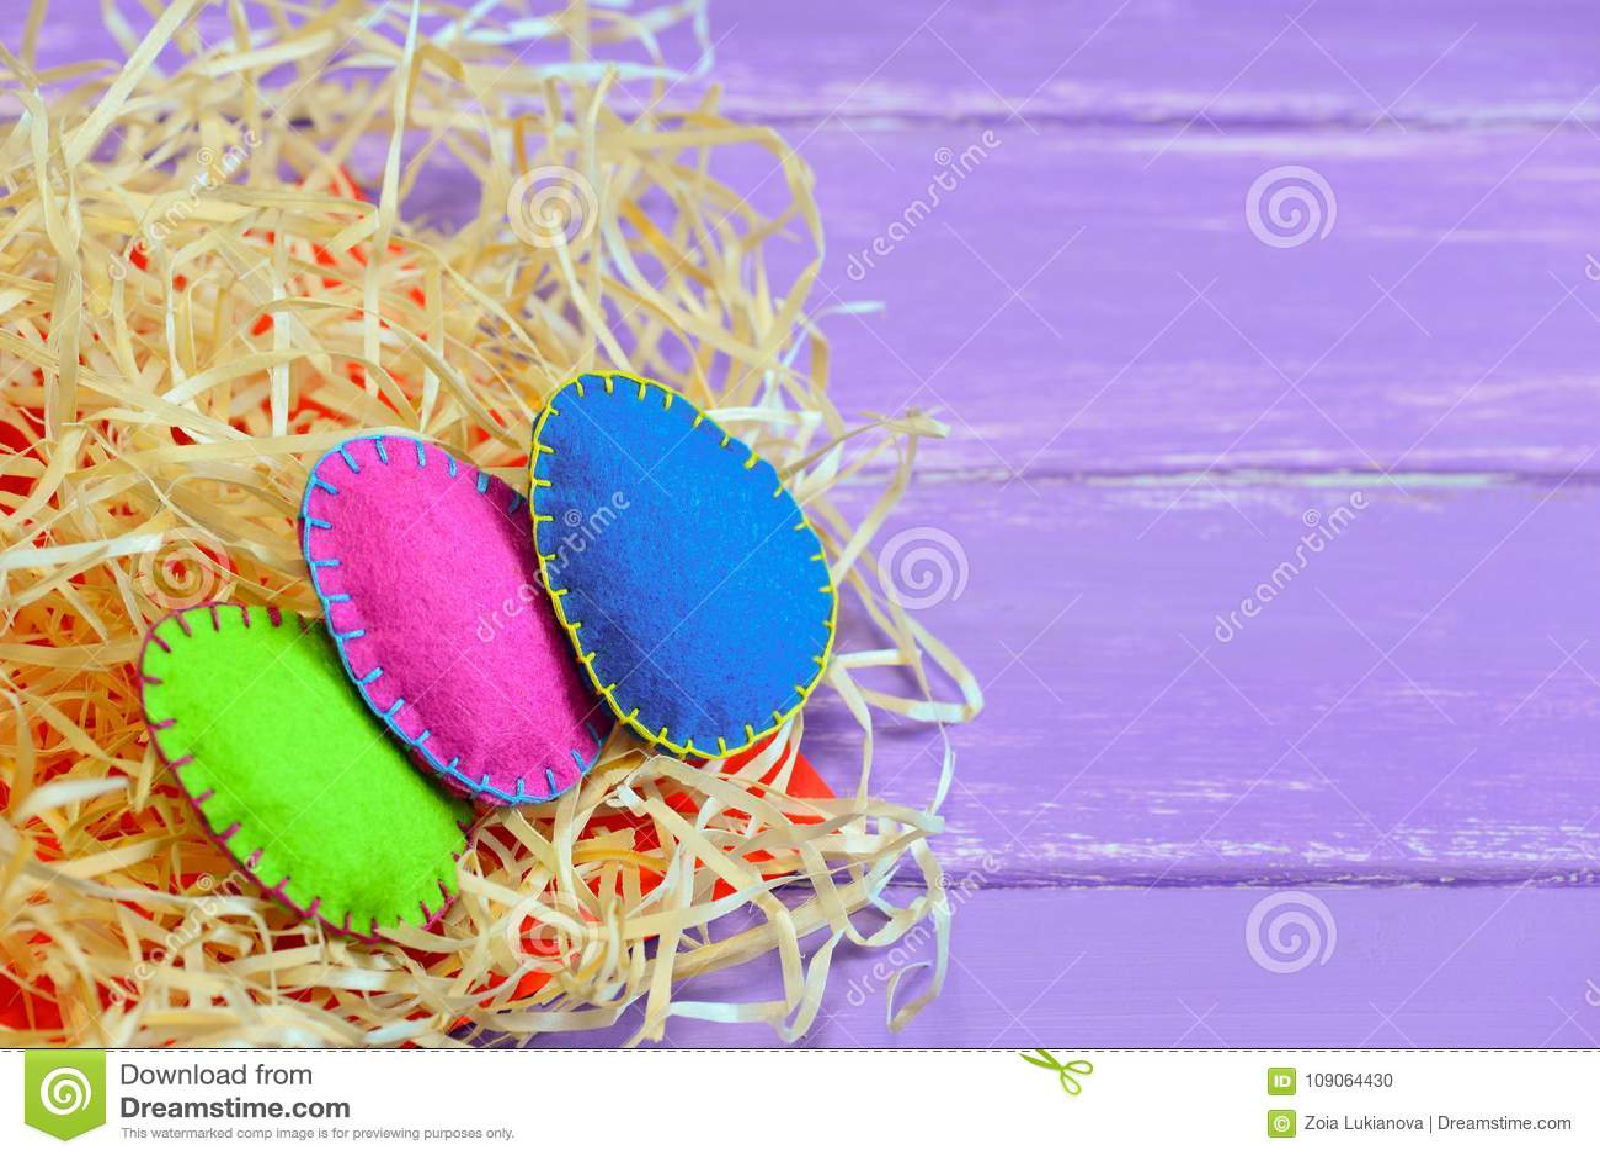 felt eggs colourful felt eggs ornaments easter eggs background